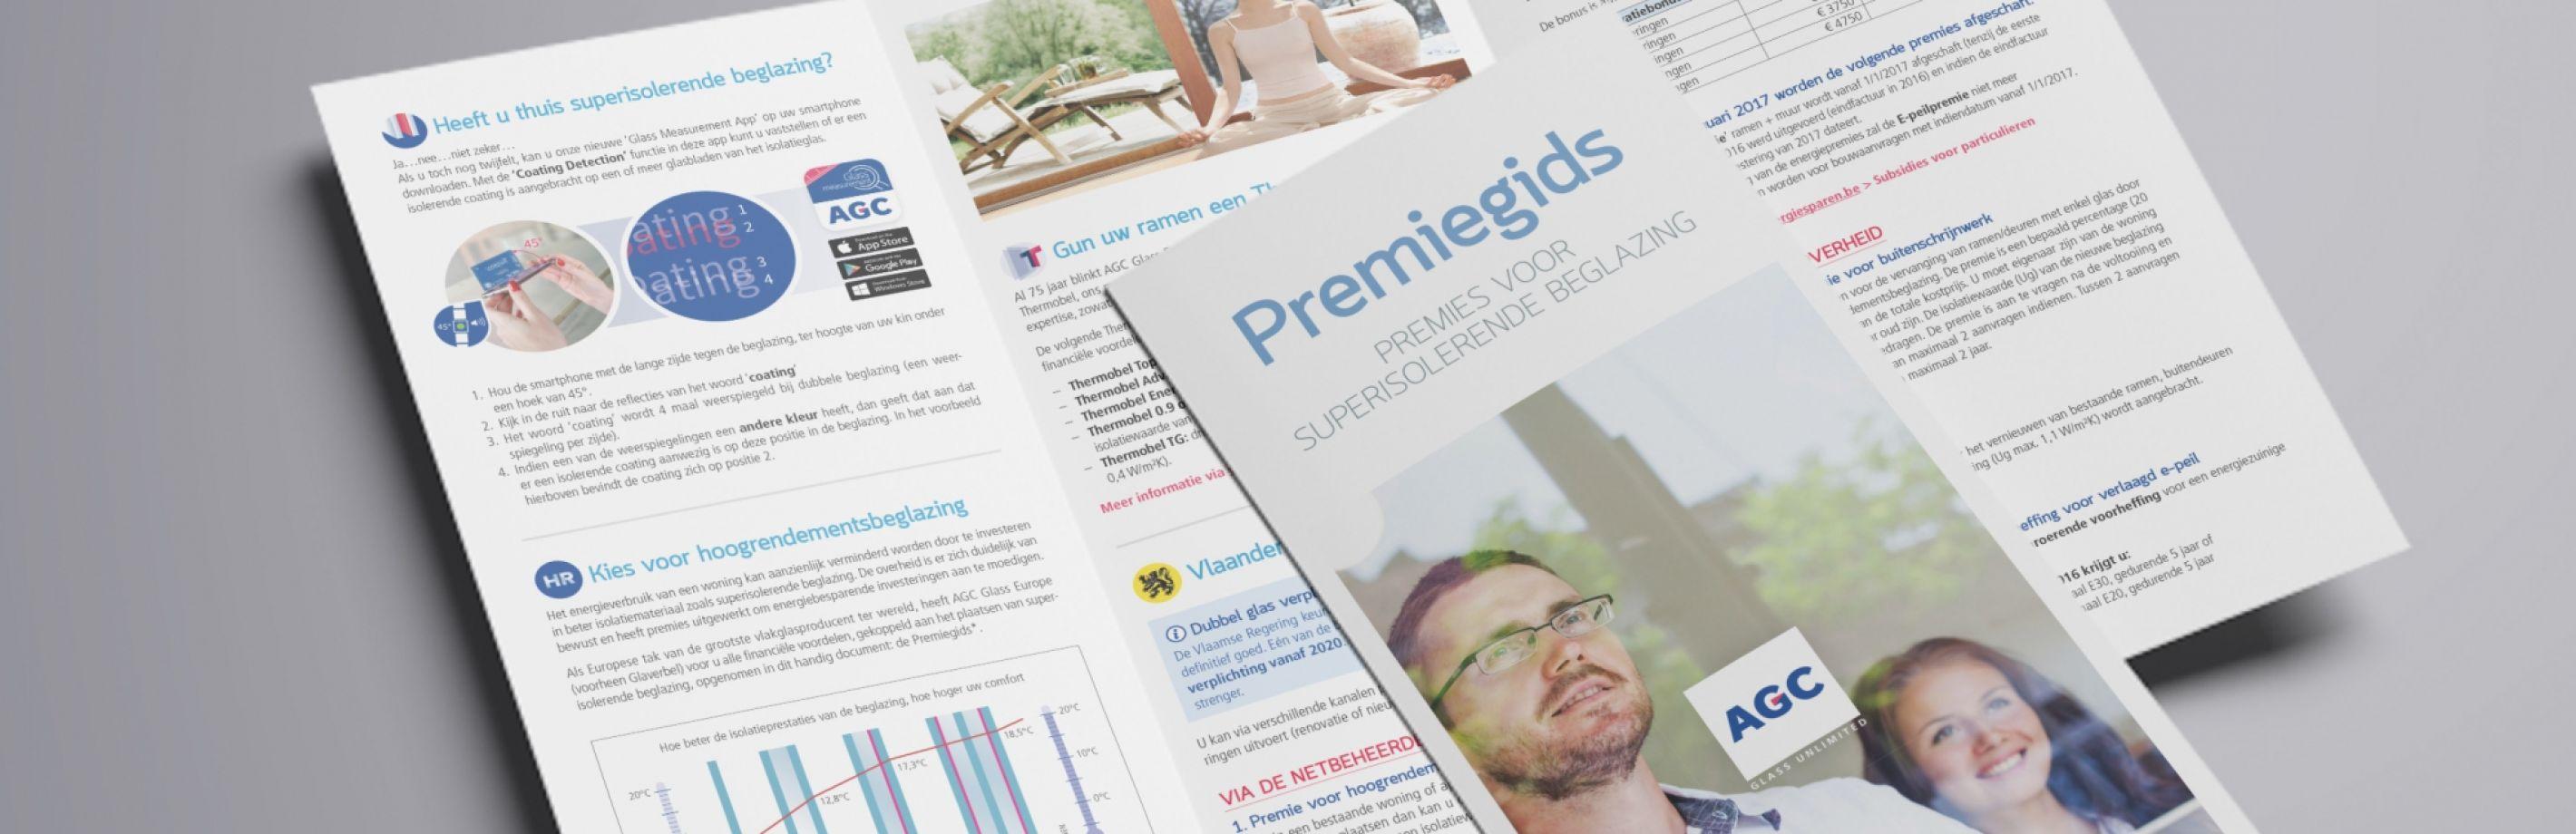 AGC Drieluik Premiegids